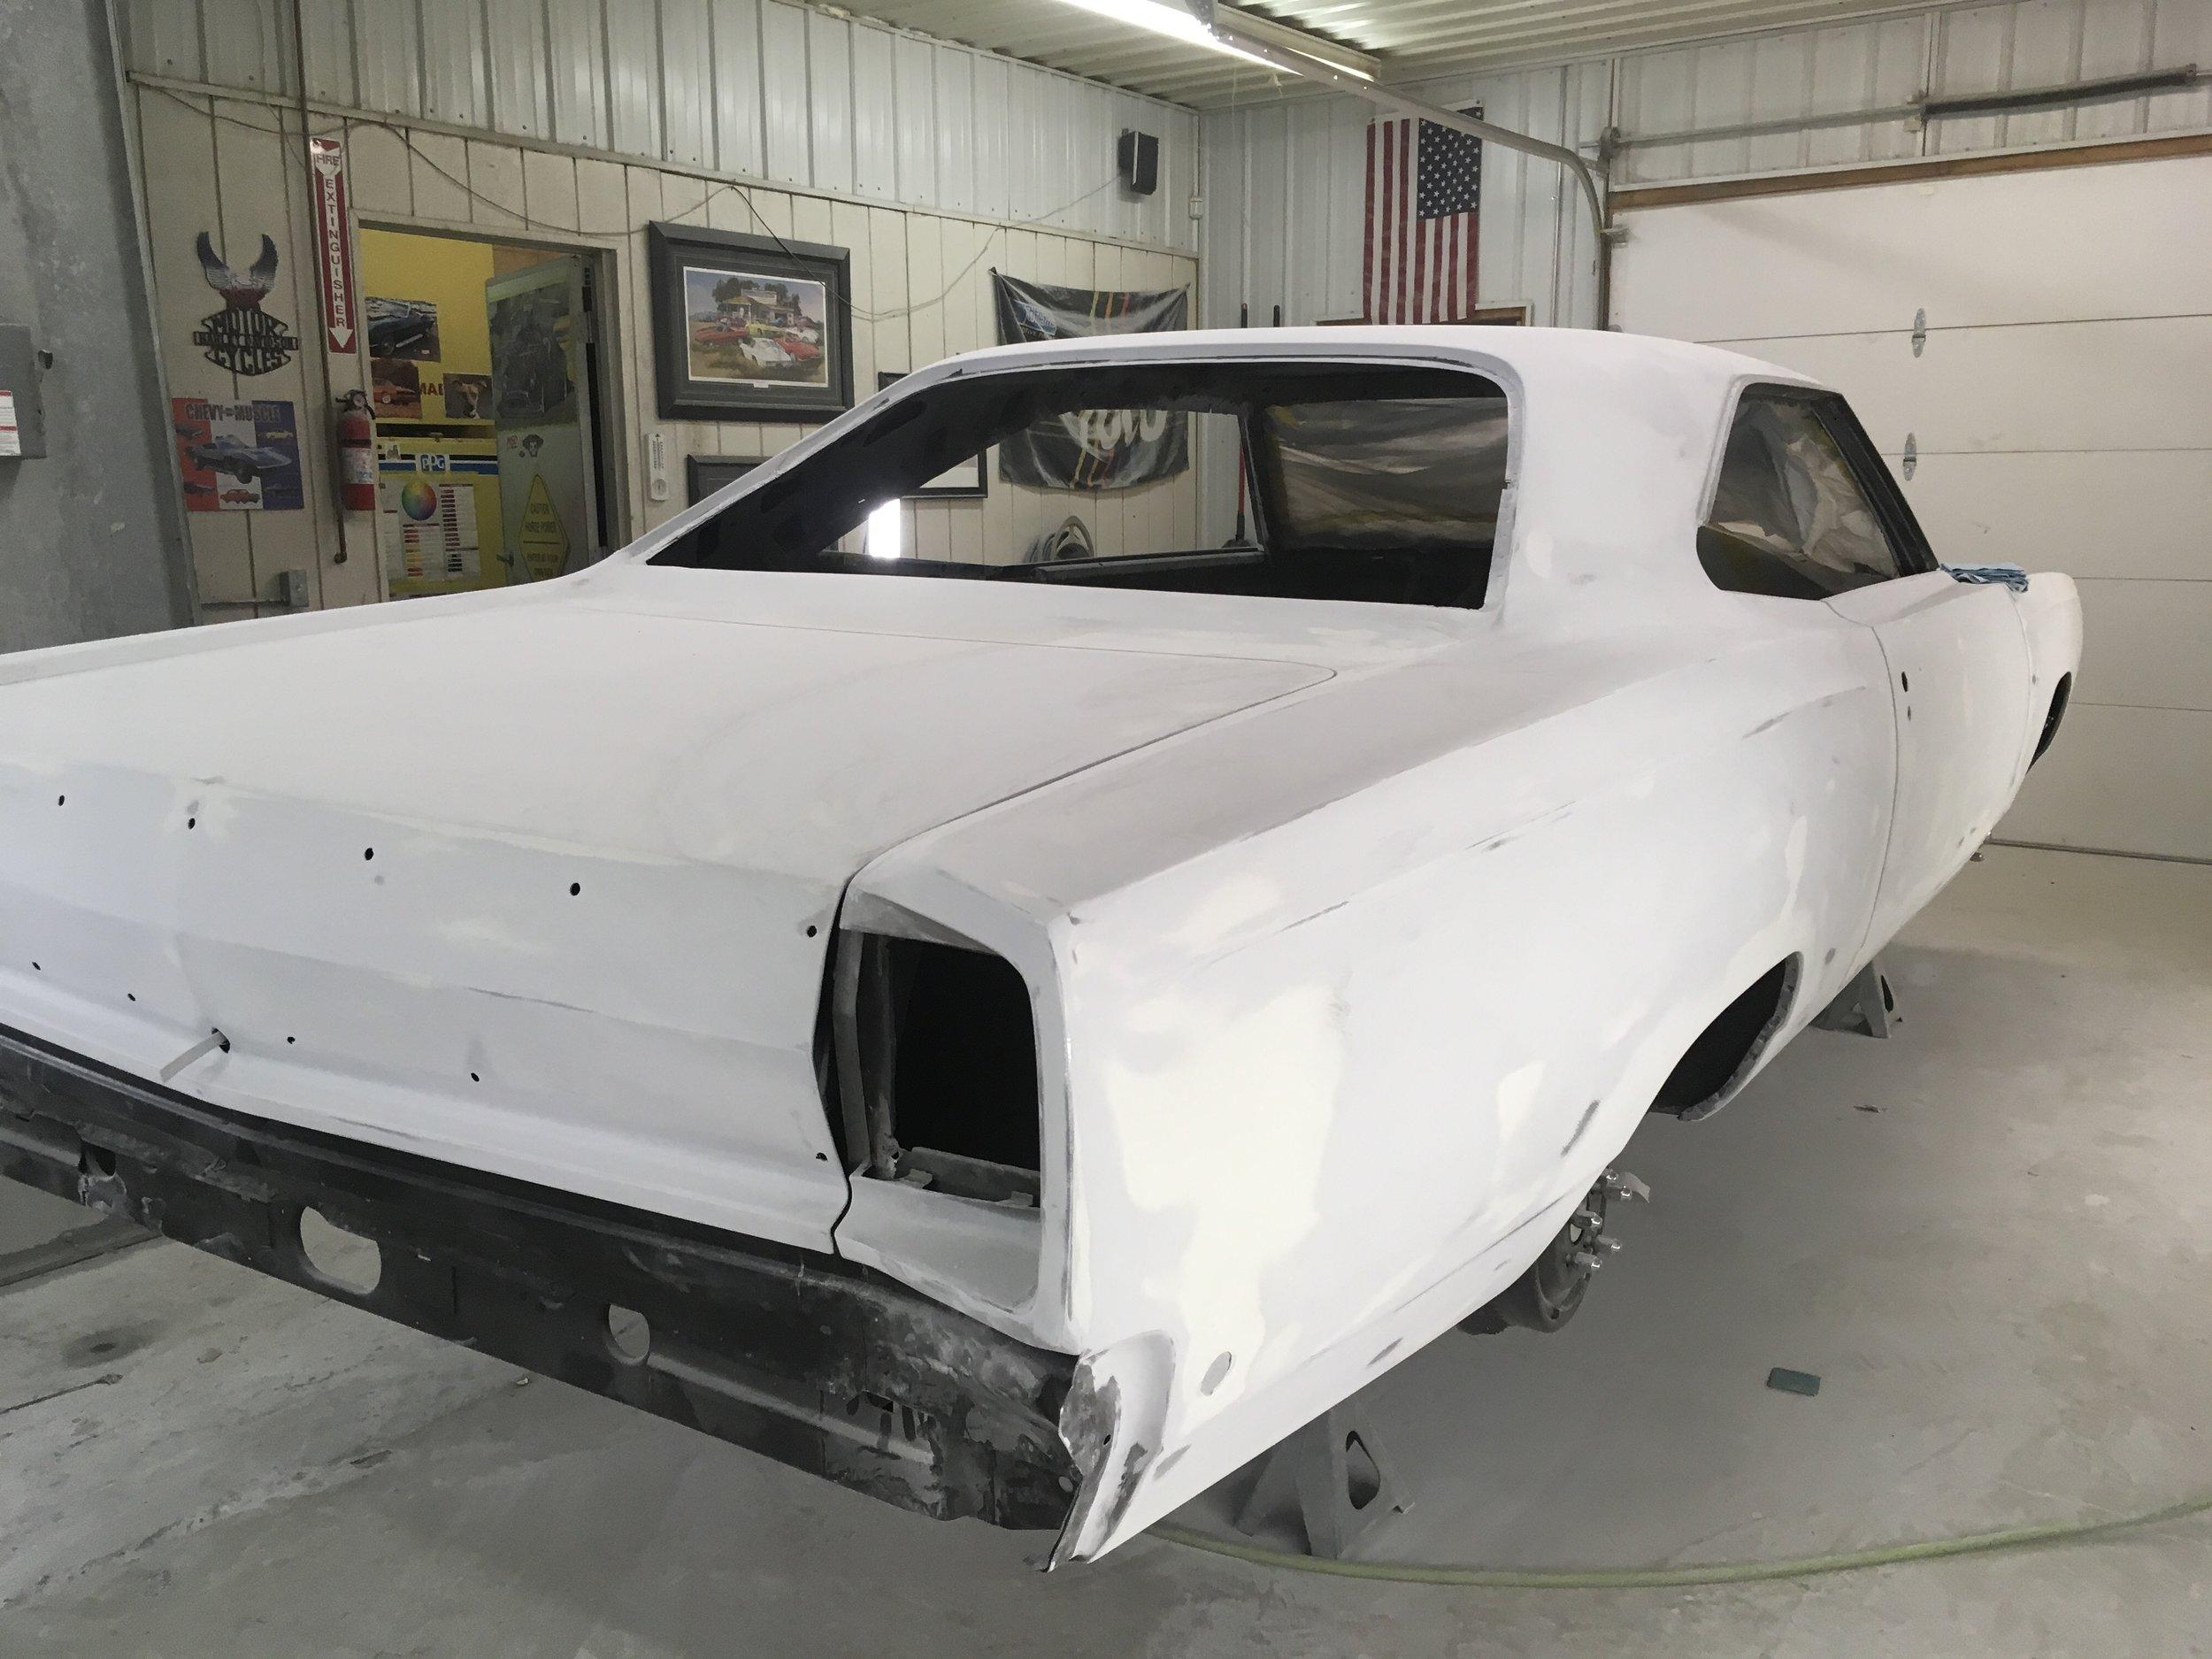 1968-Plymouth-GTX-minneapolis-custom-built-hot-rod-restoration-bodywork.jpg